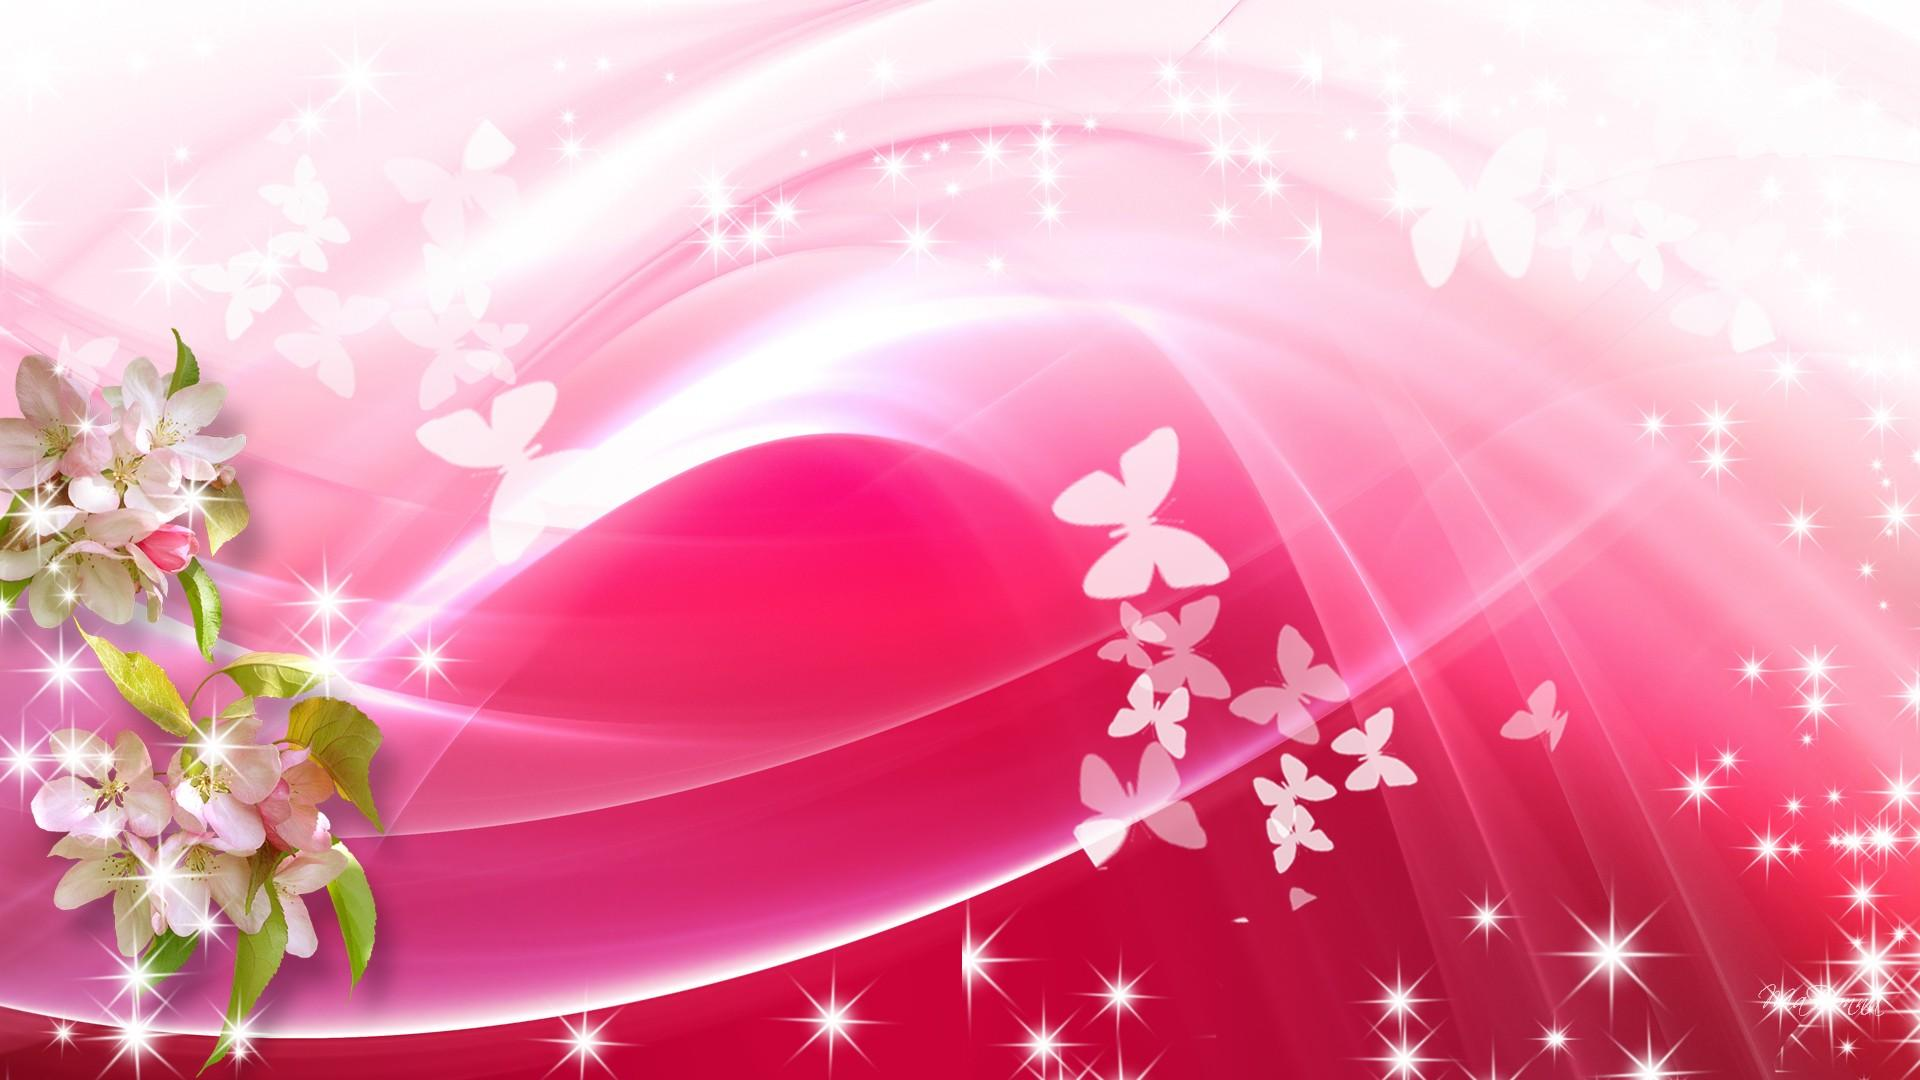 Anime Wallpaper Cherry Blossom Girl Free Bright Hd Wallpaper Download Pixelstalk Net